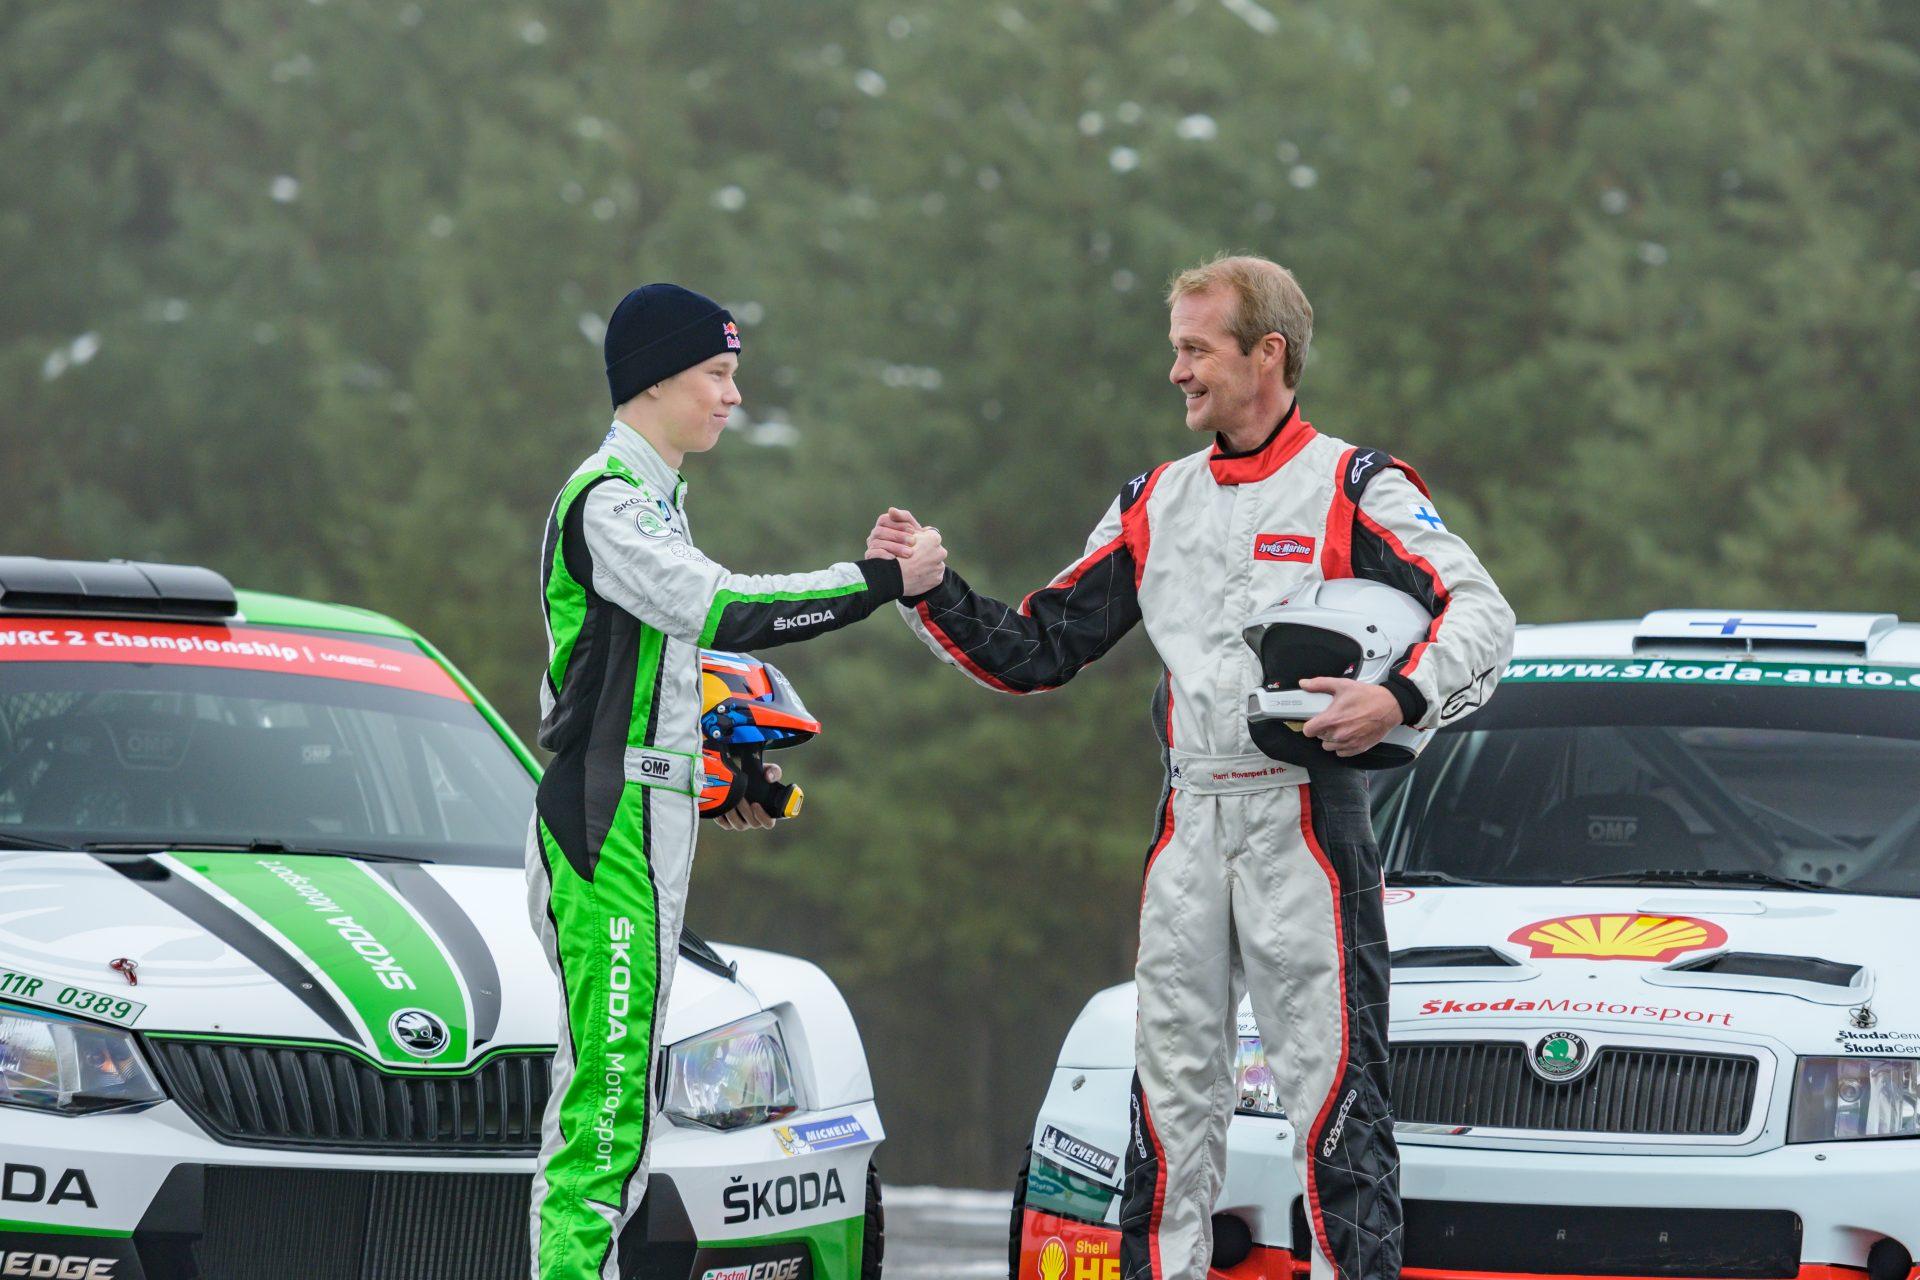 Kalle vs. Harri: Son and Father Race Their Rally ŠKODAs! | Video